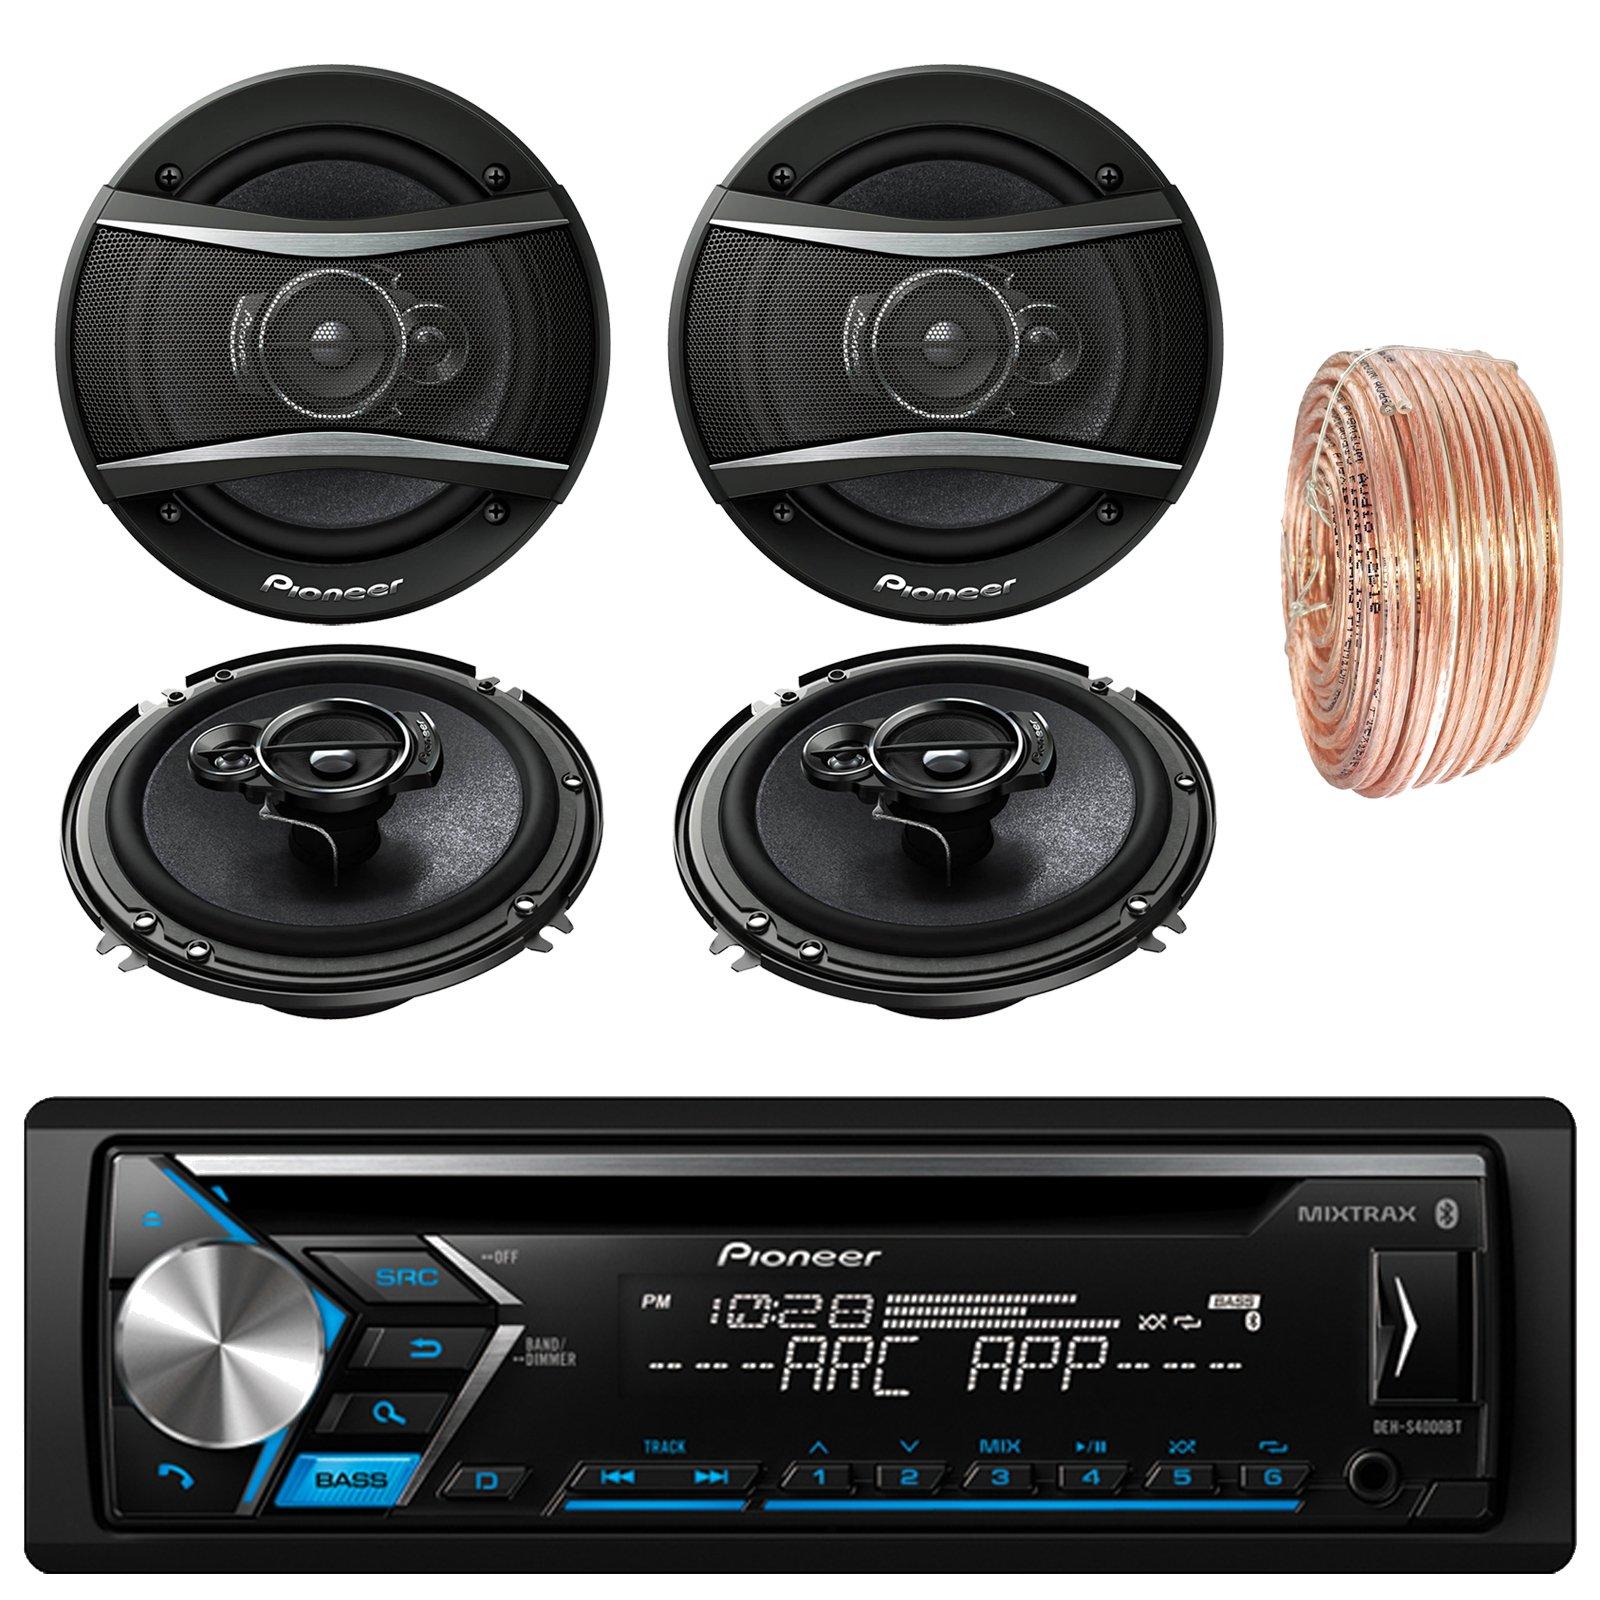 Pioneer DEH-S4000BT Car Bluetooth Radio USB AUX CD Player Receiver - Bundle With 2x TSA1676R 6.5'' 3-Way Speakers - 2 x TS-A6966R 6''x9'' 3-way Speakers + Enrock 50Ft 18 Gauge Speaker Wire